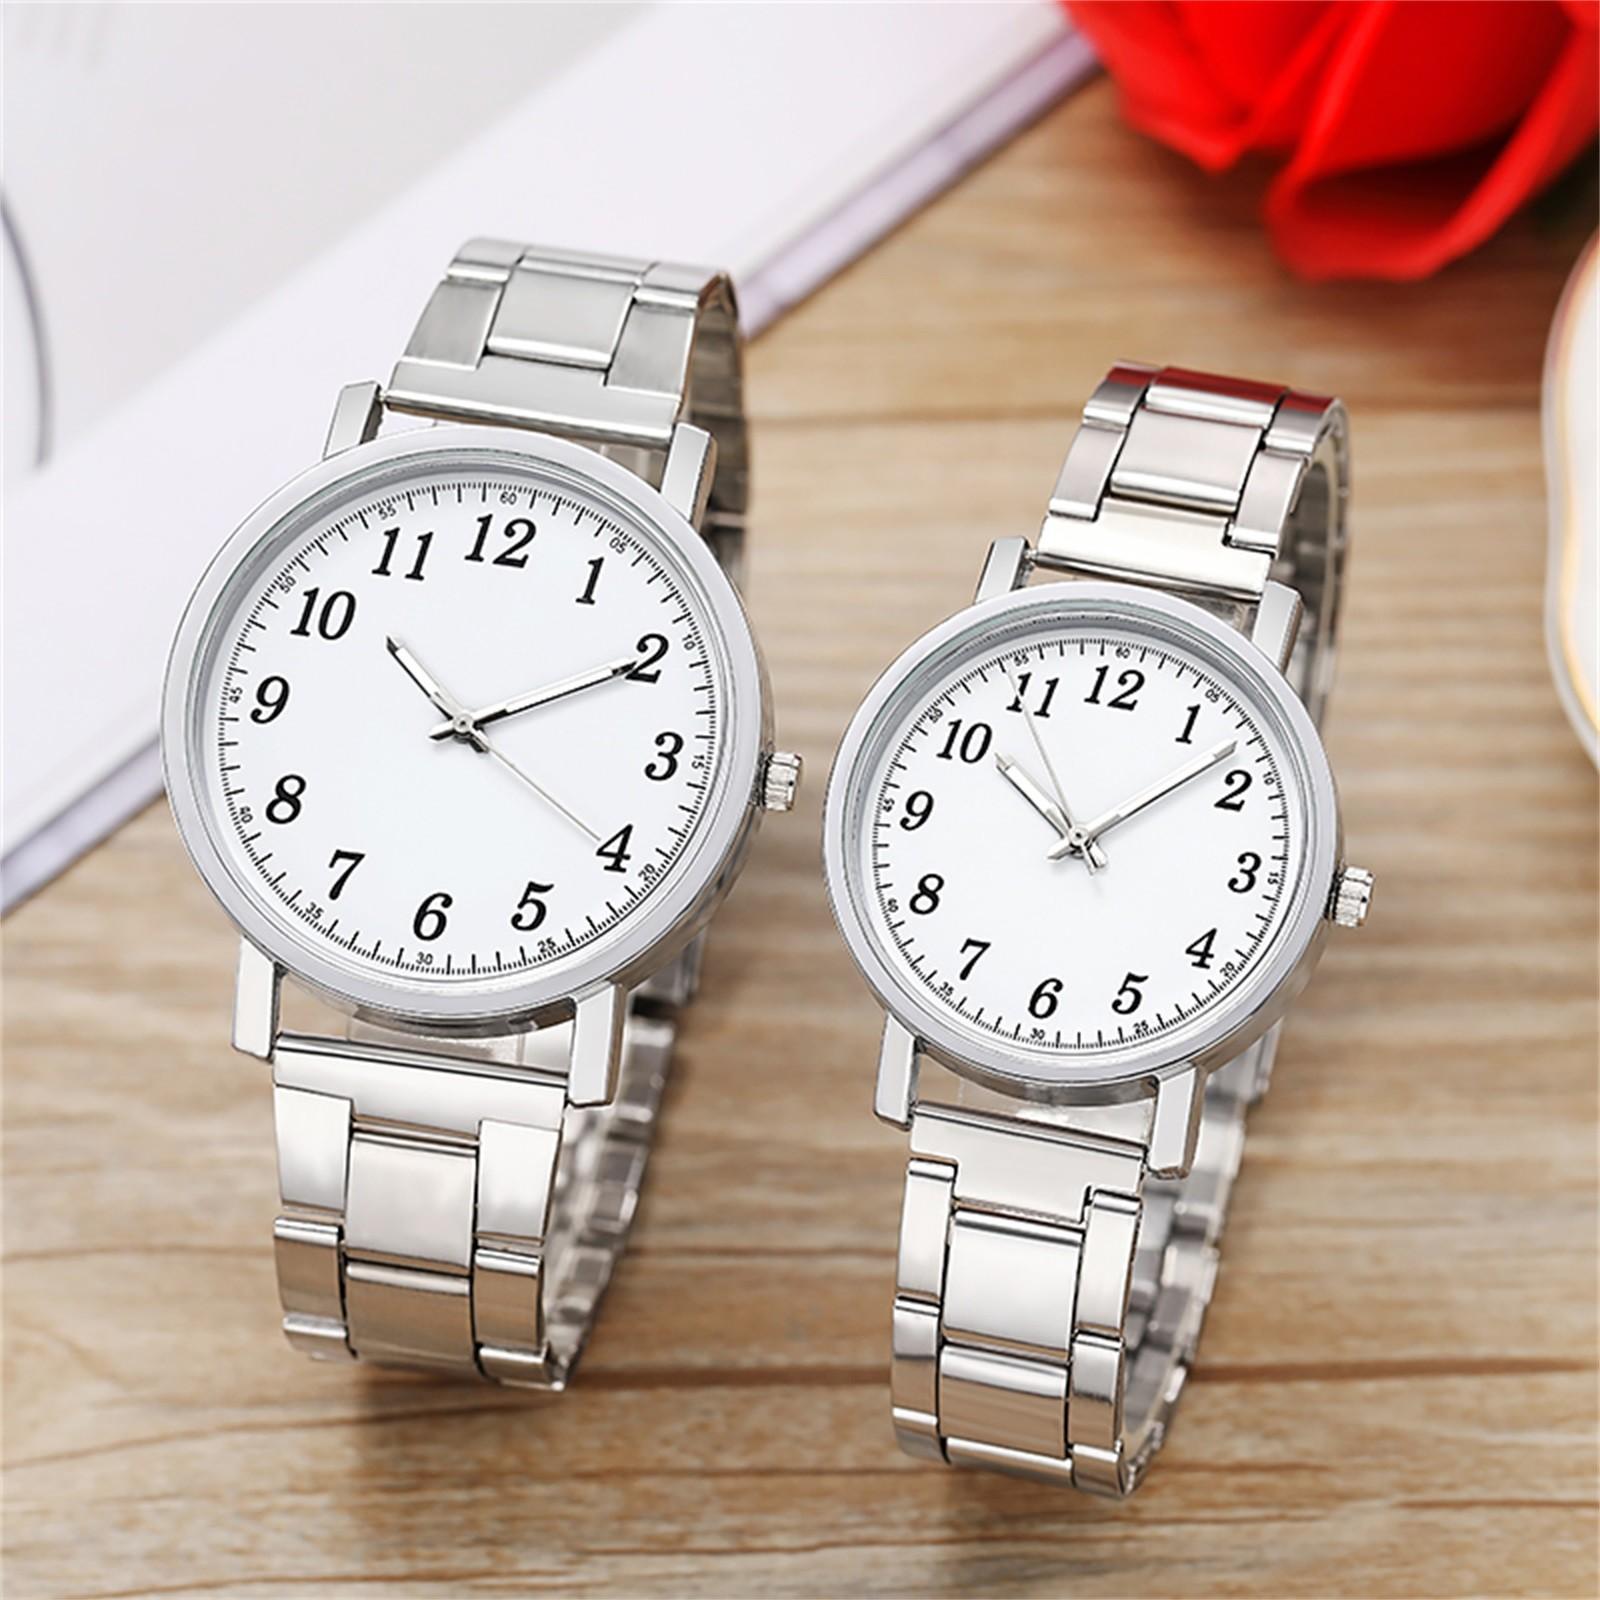 Часы женские кварцевые, наручные часы, пара, кварцевые цифровые часы, модные женские часы, часы-браслет, женские часы, новинка 2021 # P3